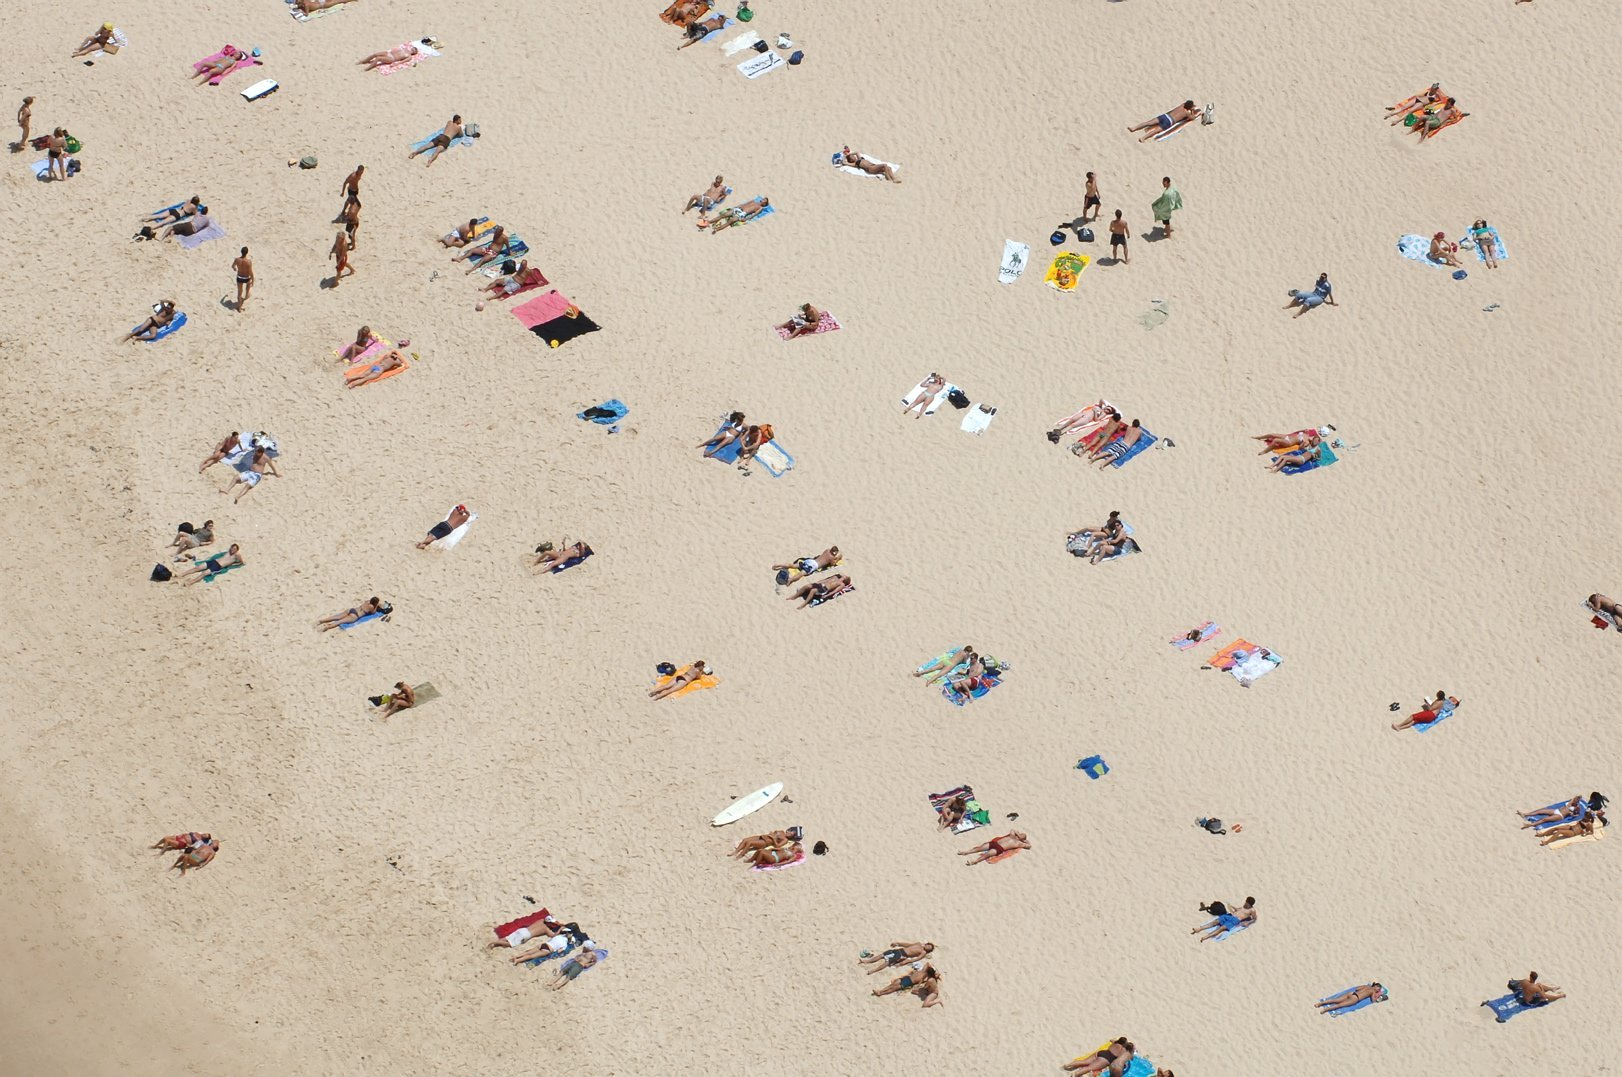 An aerial looking over people relaxing on Bondi Beach, Australia, Dec. 17, 2005.